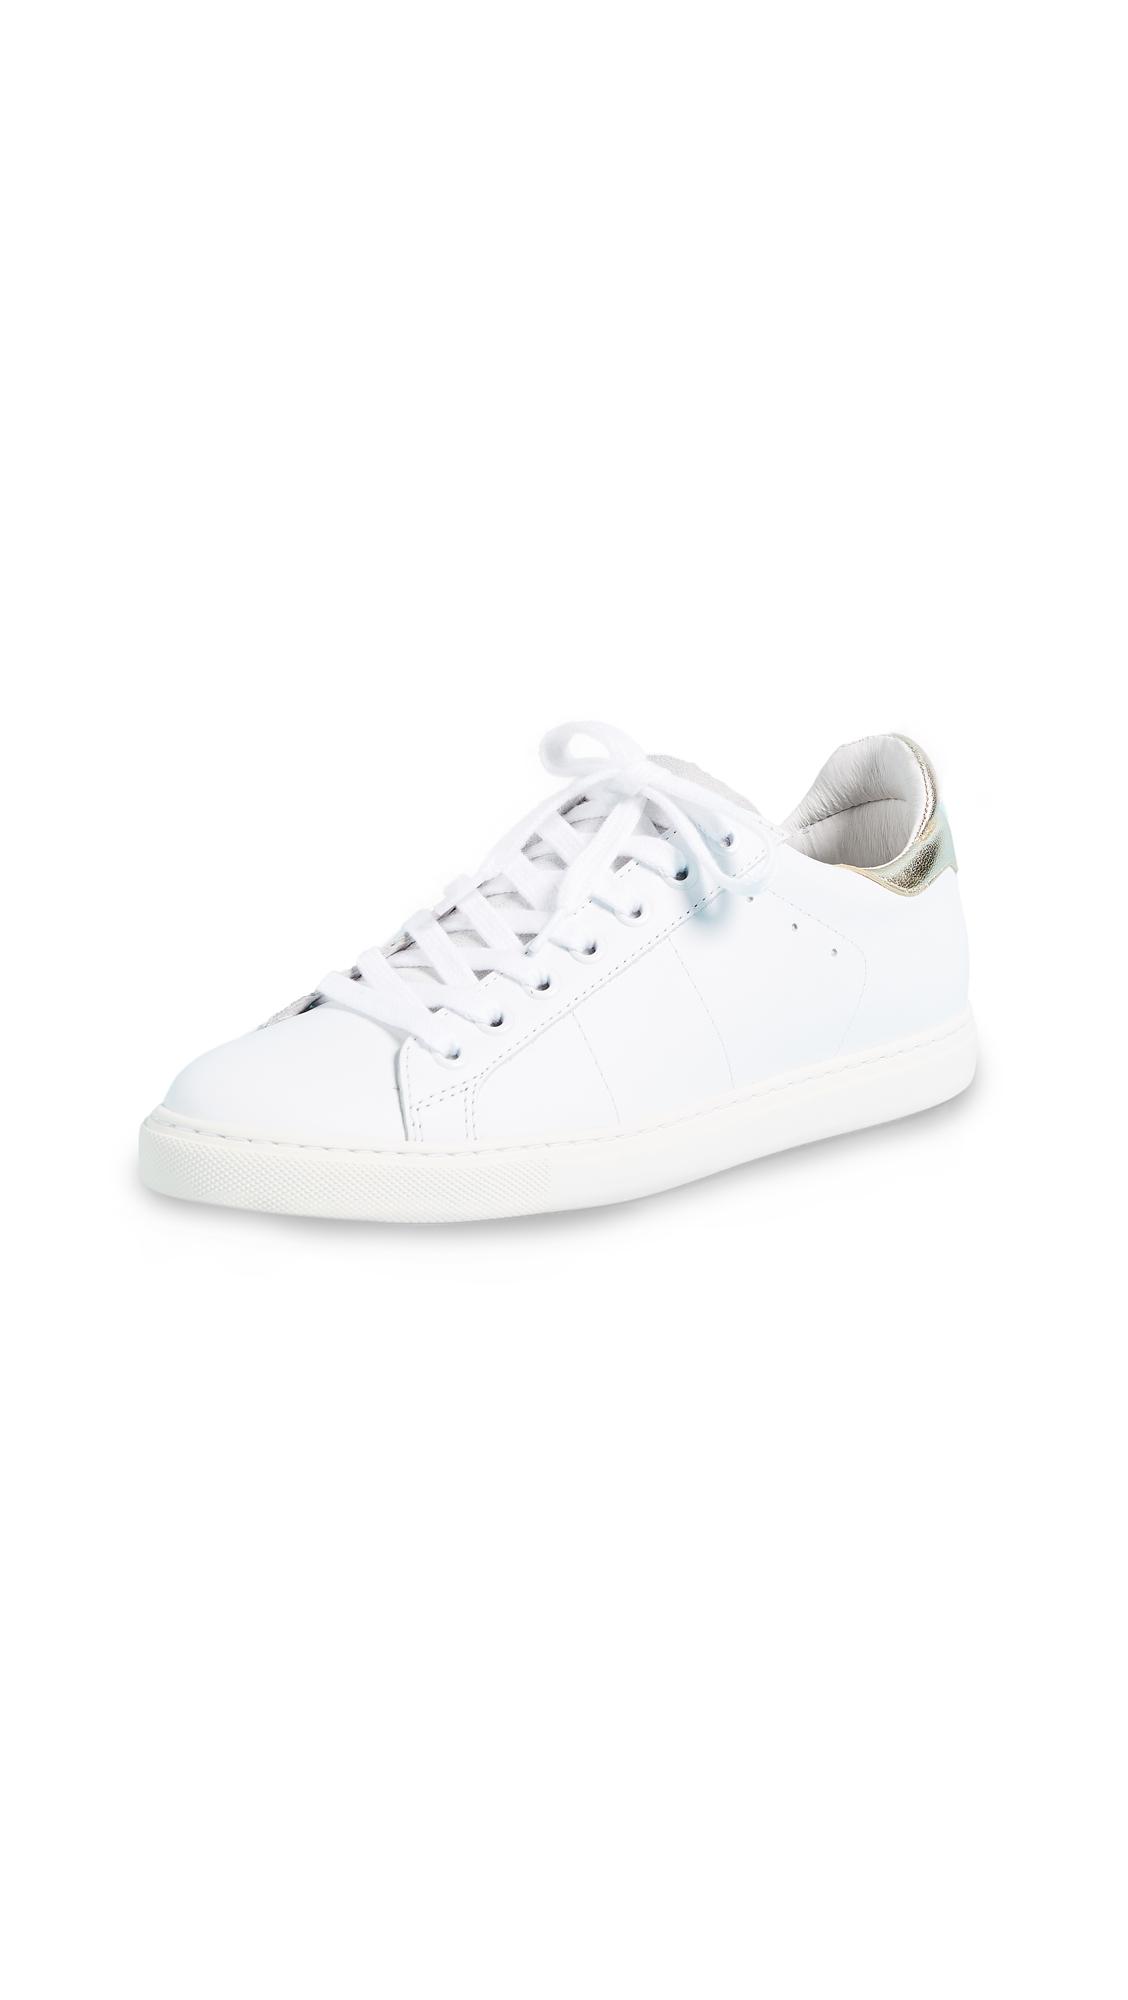 IRO Basic Sneakers - White/Gold